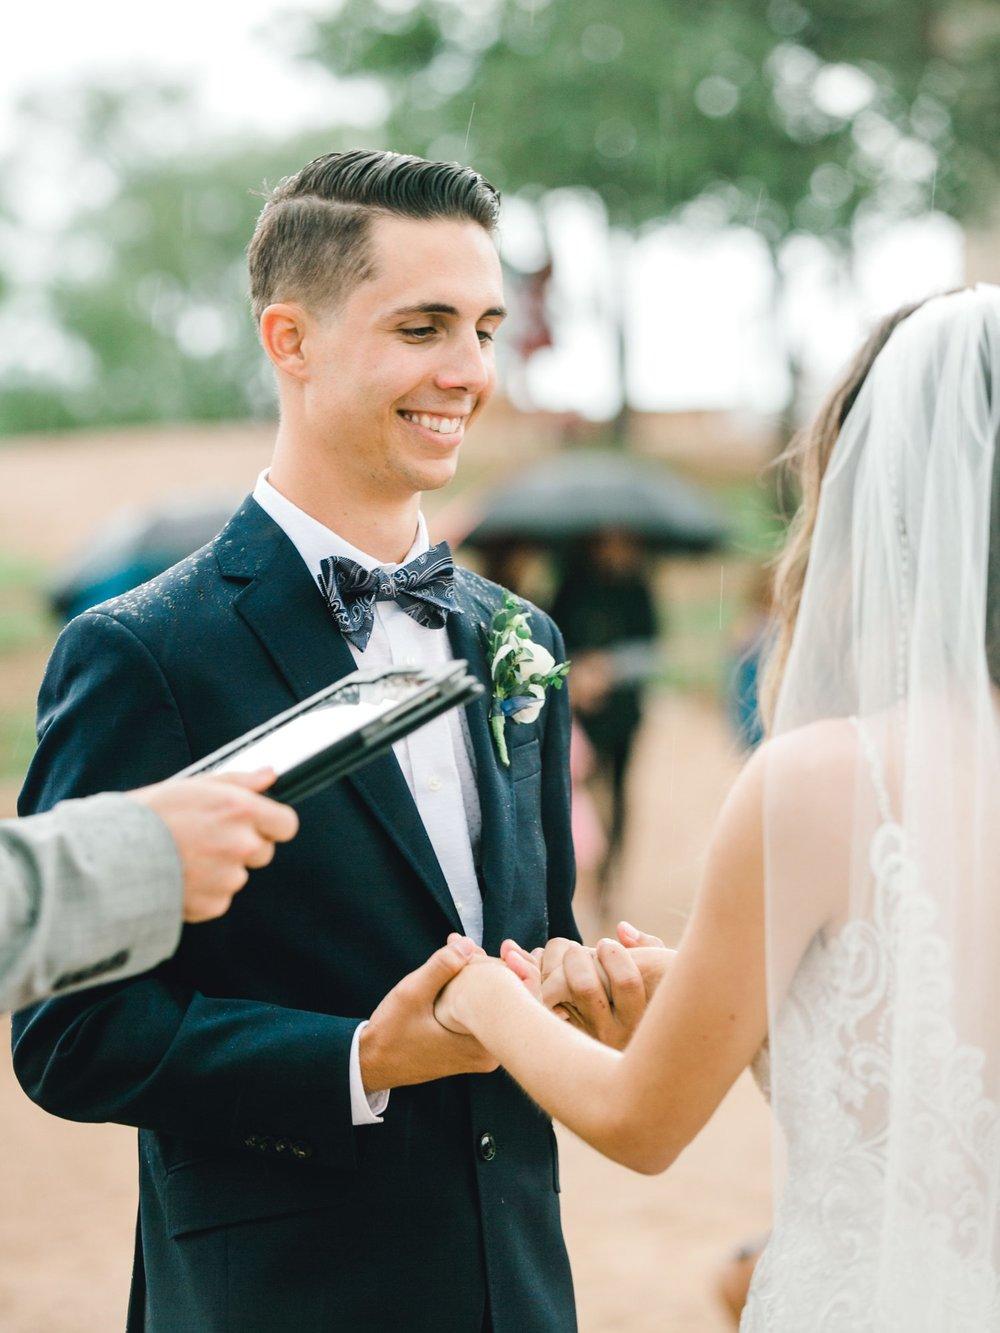 Ashley_John_English_Elegant_Texas_Wedding_Outdoors_Ranch_Caprock_Winery_ALLEEJ_0137.jpg